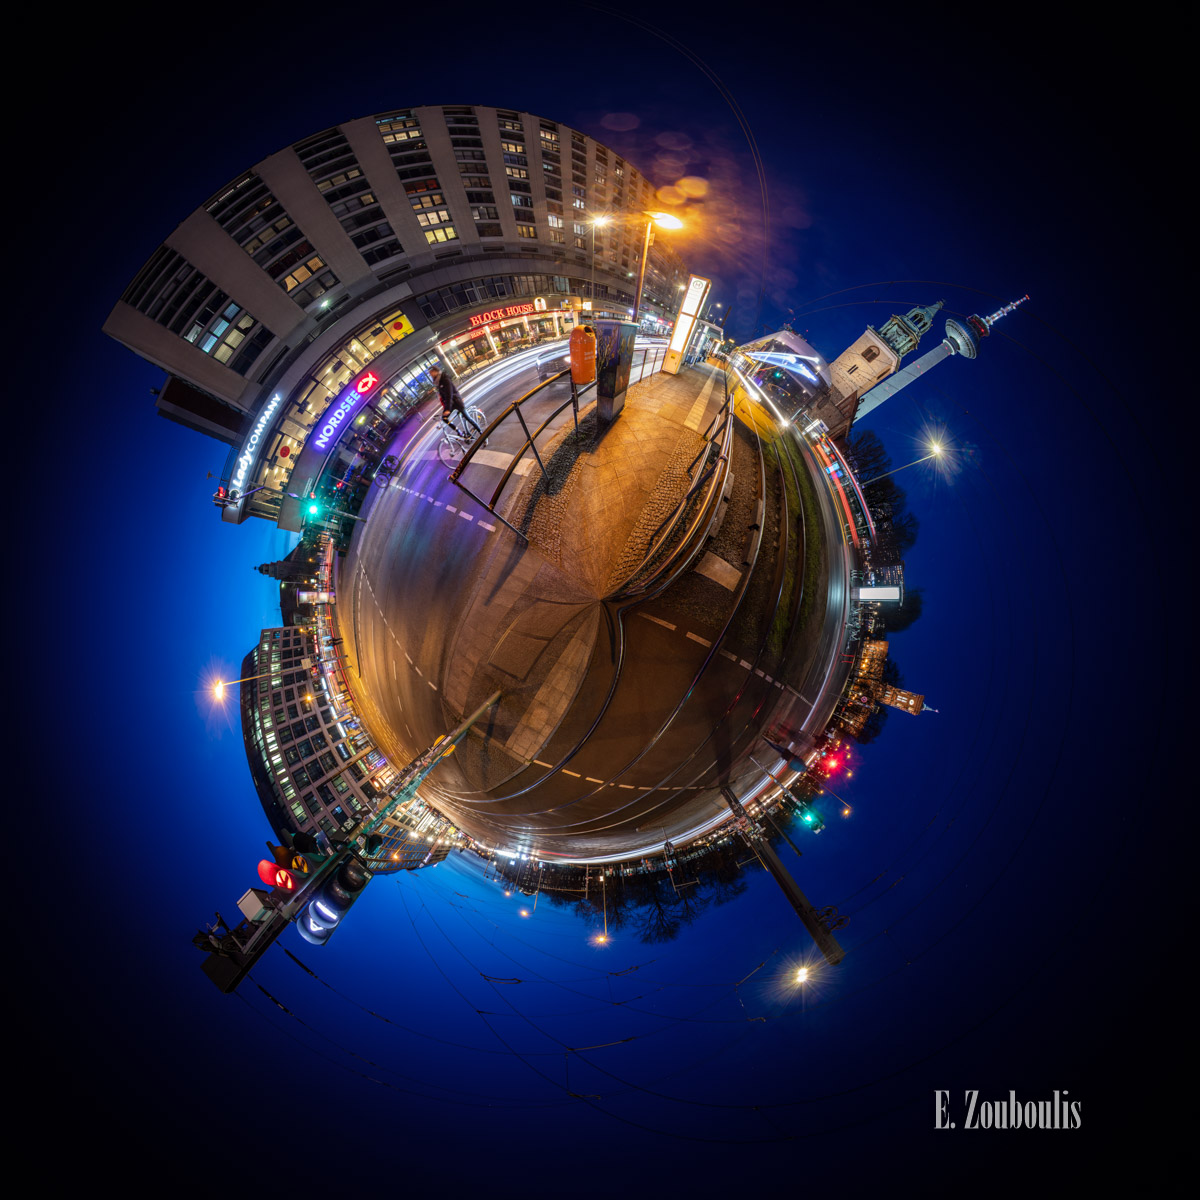 Planet Berlin Crossroads - An der Kreuzung Spandauer Straße in Berlin bei Nacht als kleiner Planet